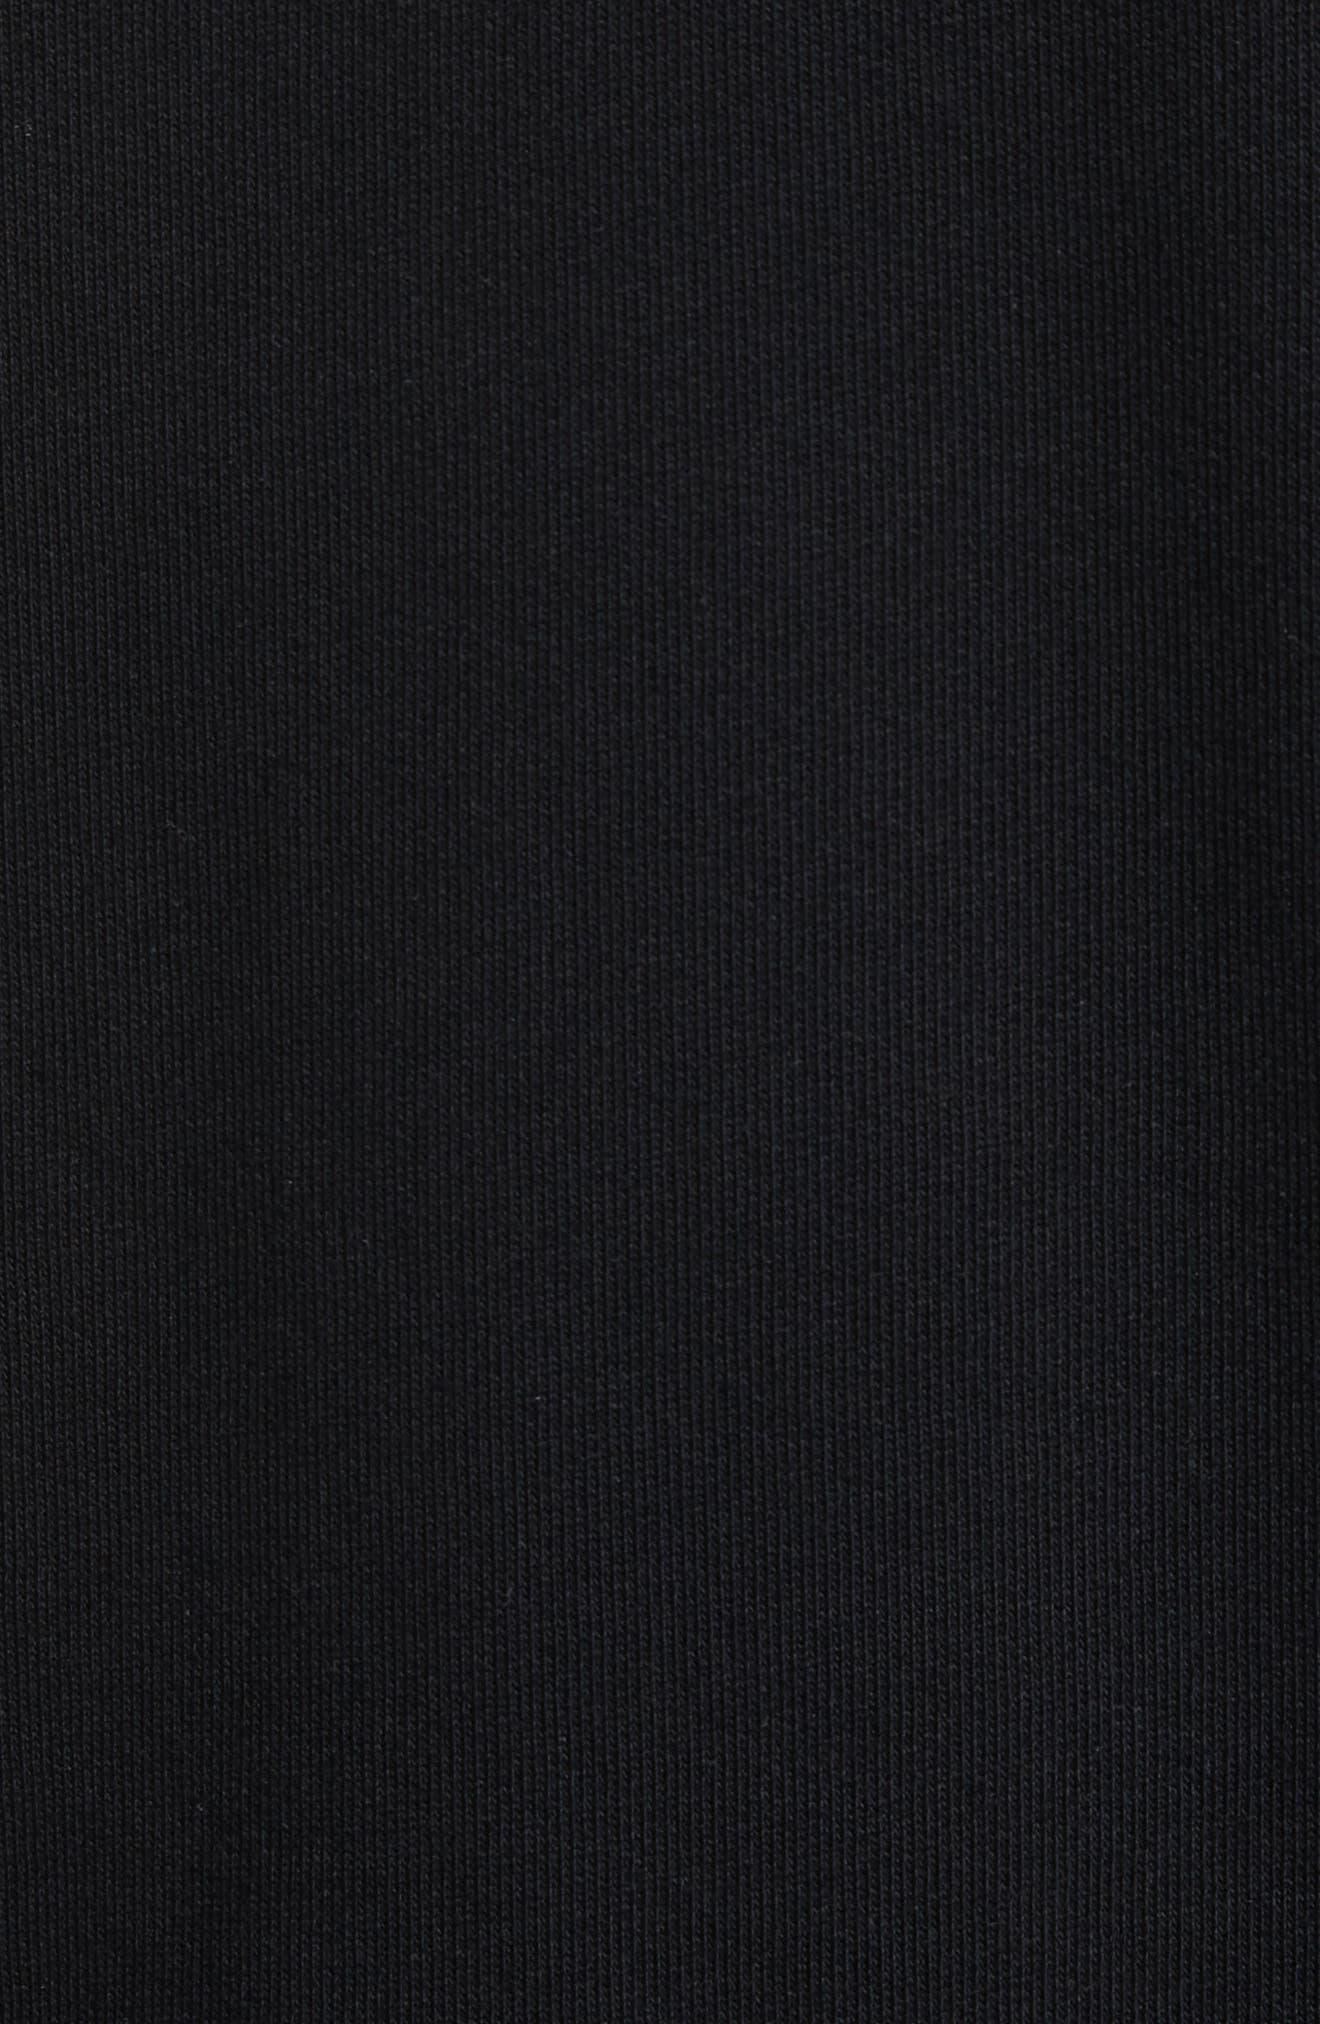 Mesh Star Crewneck Sweatshirt,                             Alternate thumbnail 5, color,                             Black